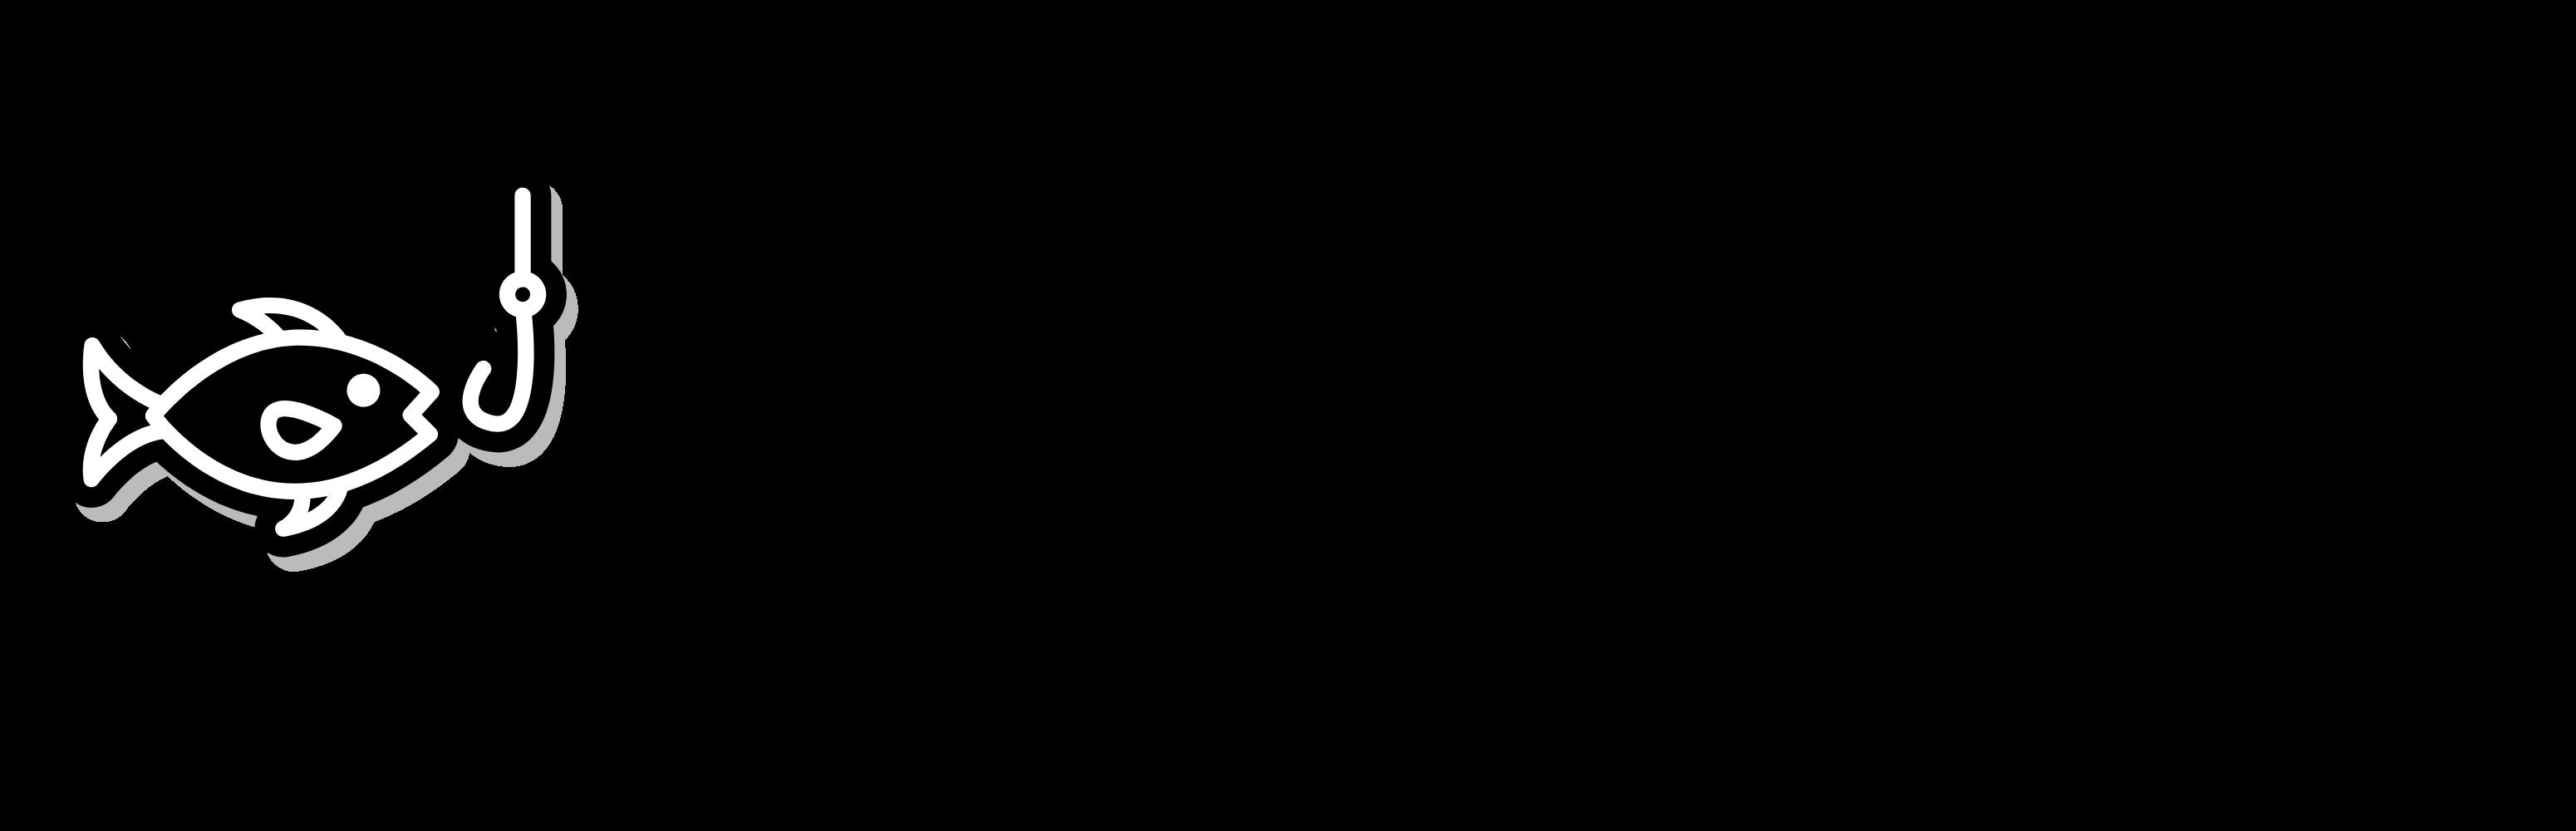 Latched Creative Logo